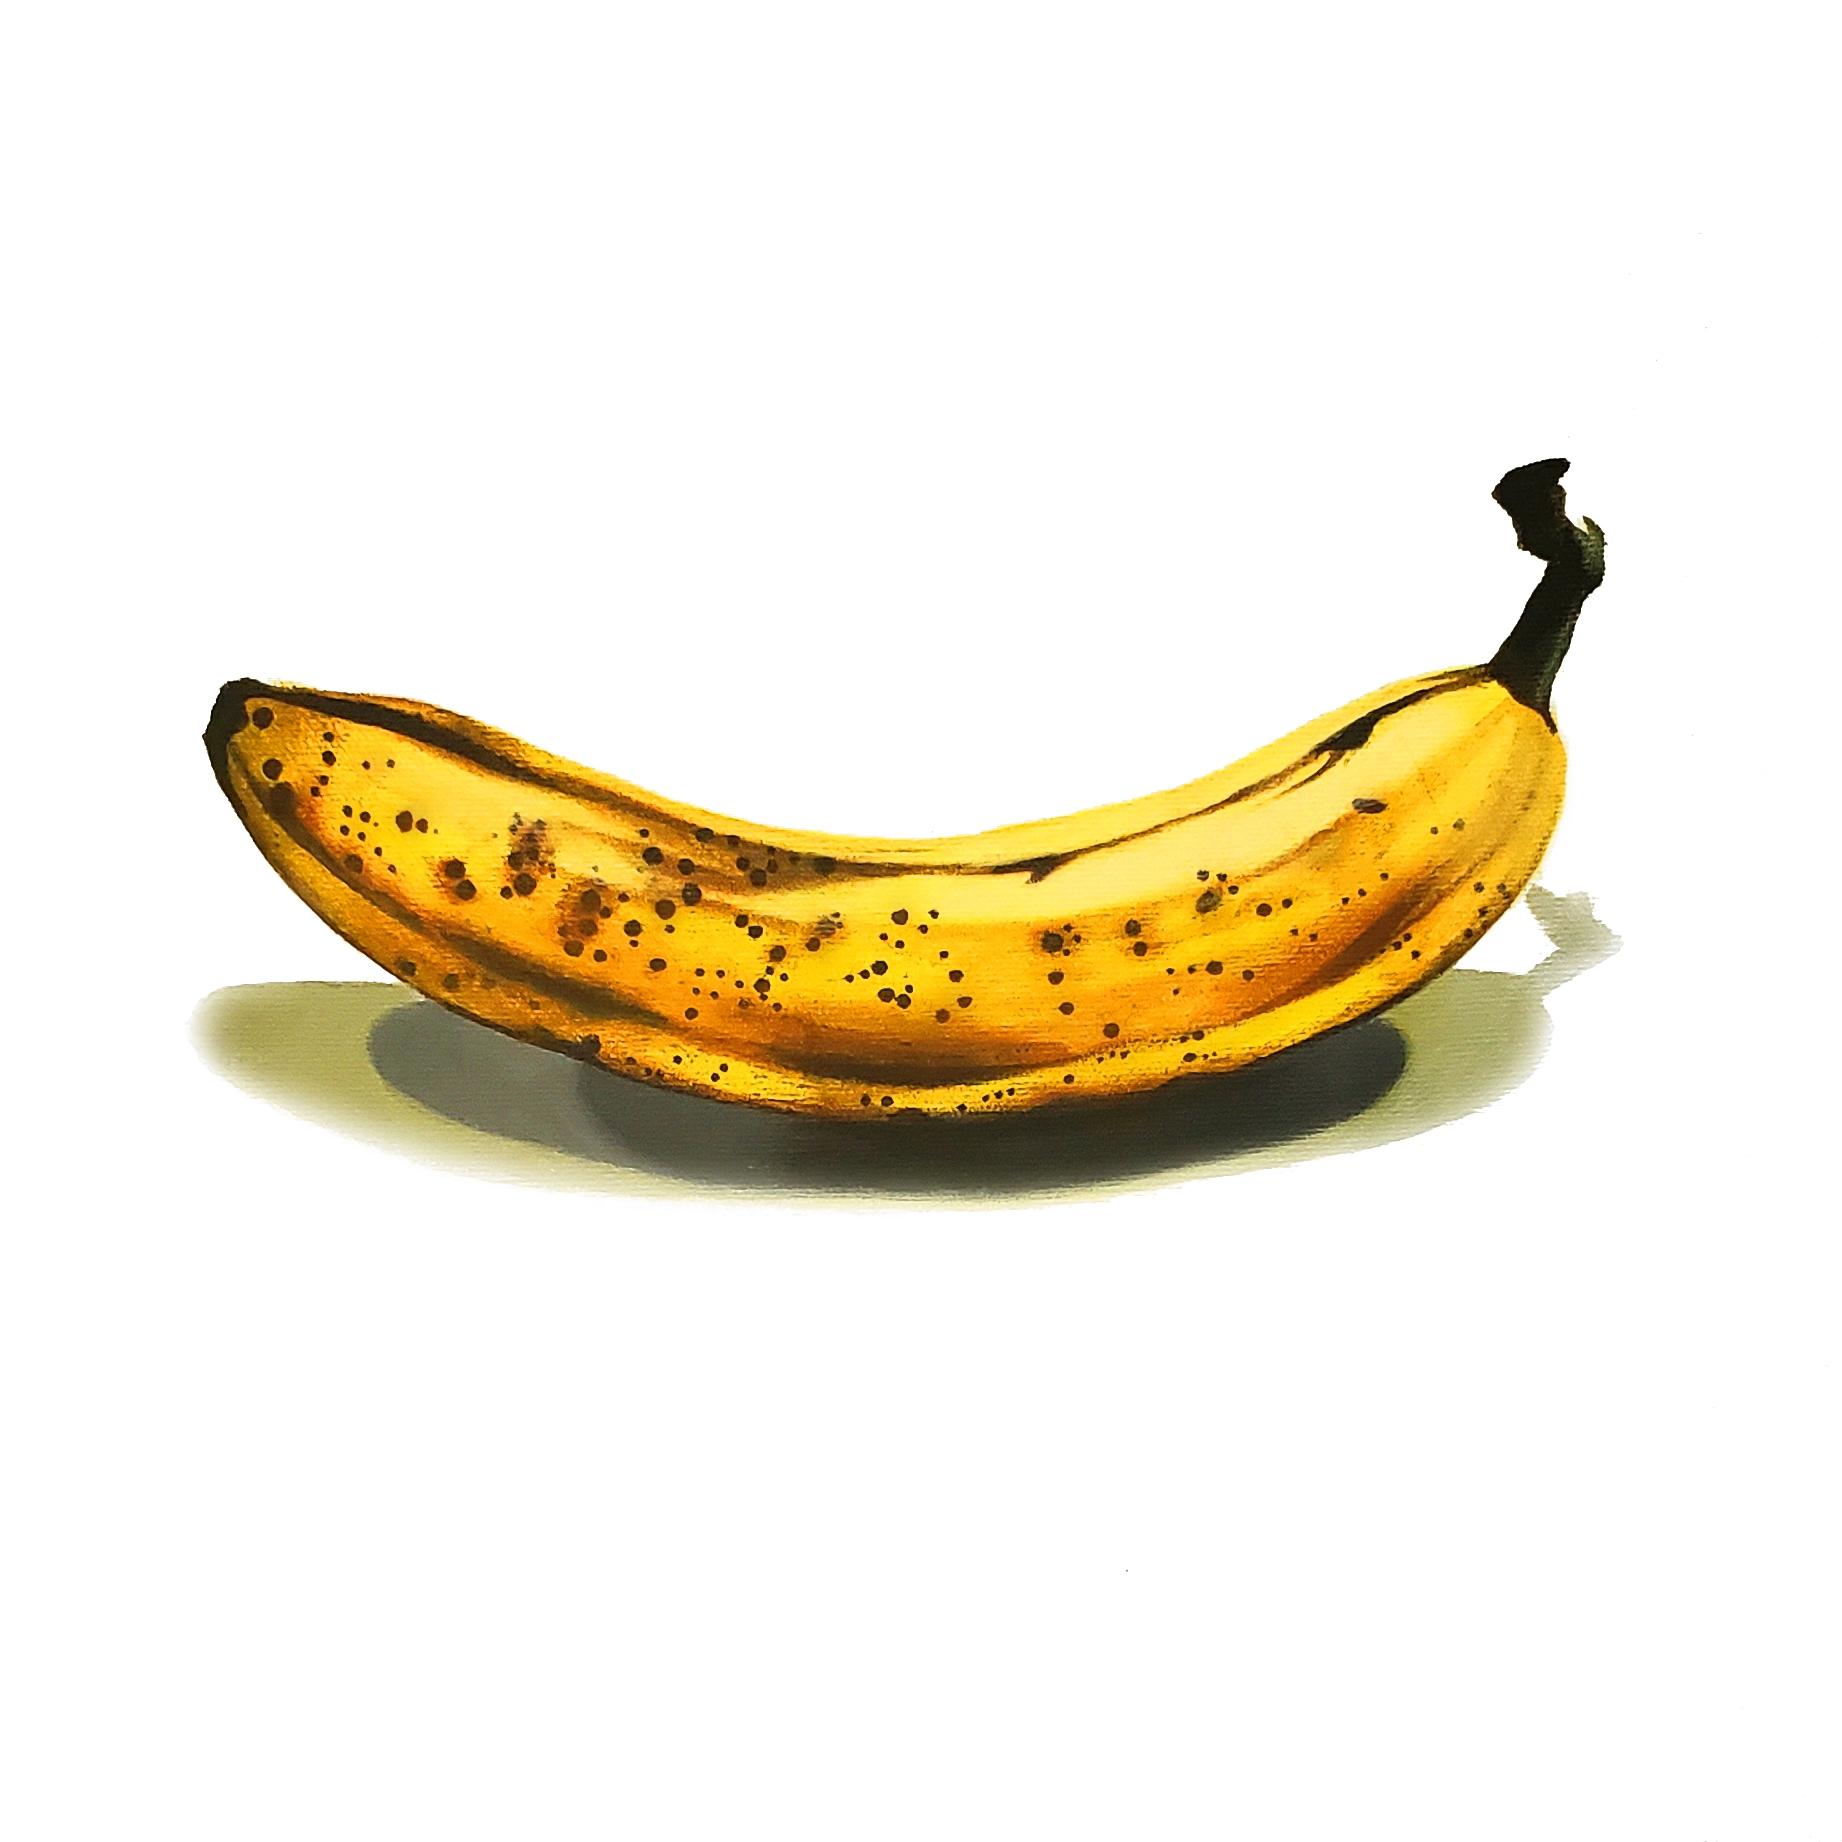 Tasting Room: Banana  by Erin Rothstein